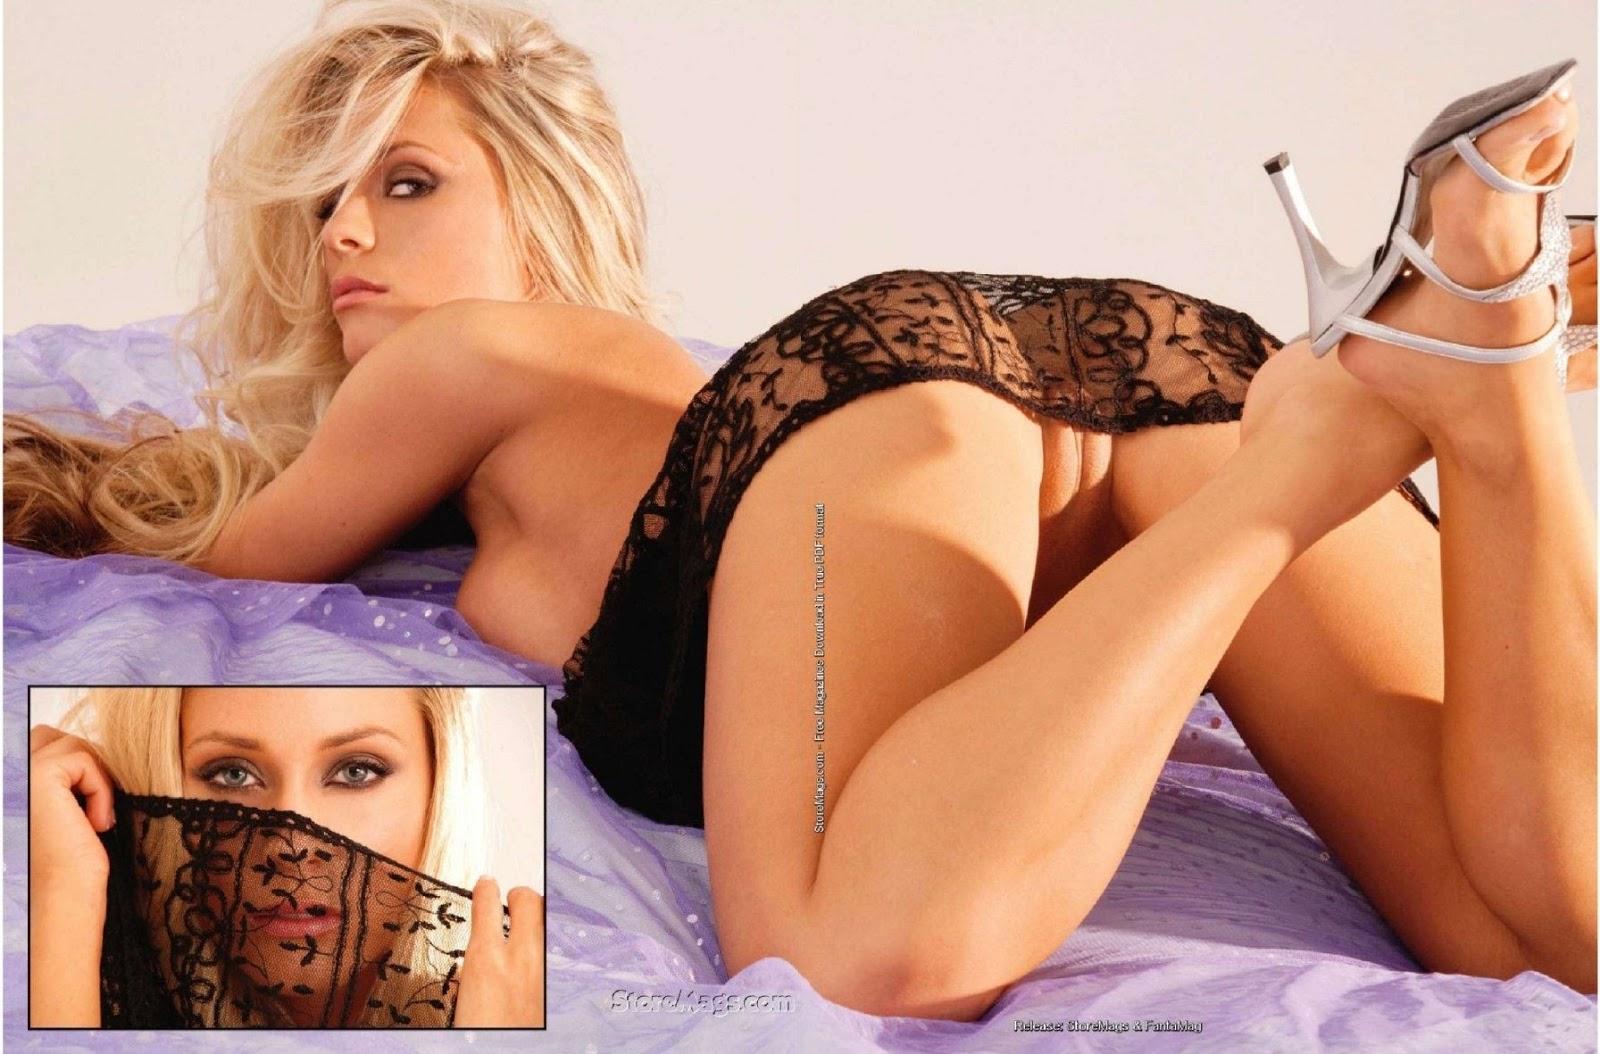 Alyssa Marie Nude Alyssa Marie Playboy Nude: krlite.jpg4.info/Alyssa+Marie+Nude/pic4.html